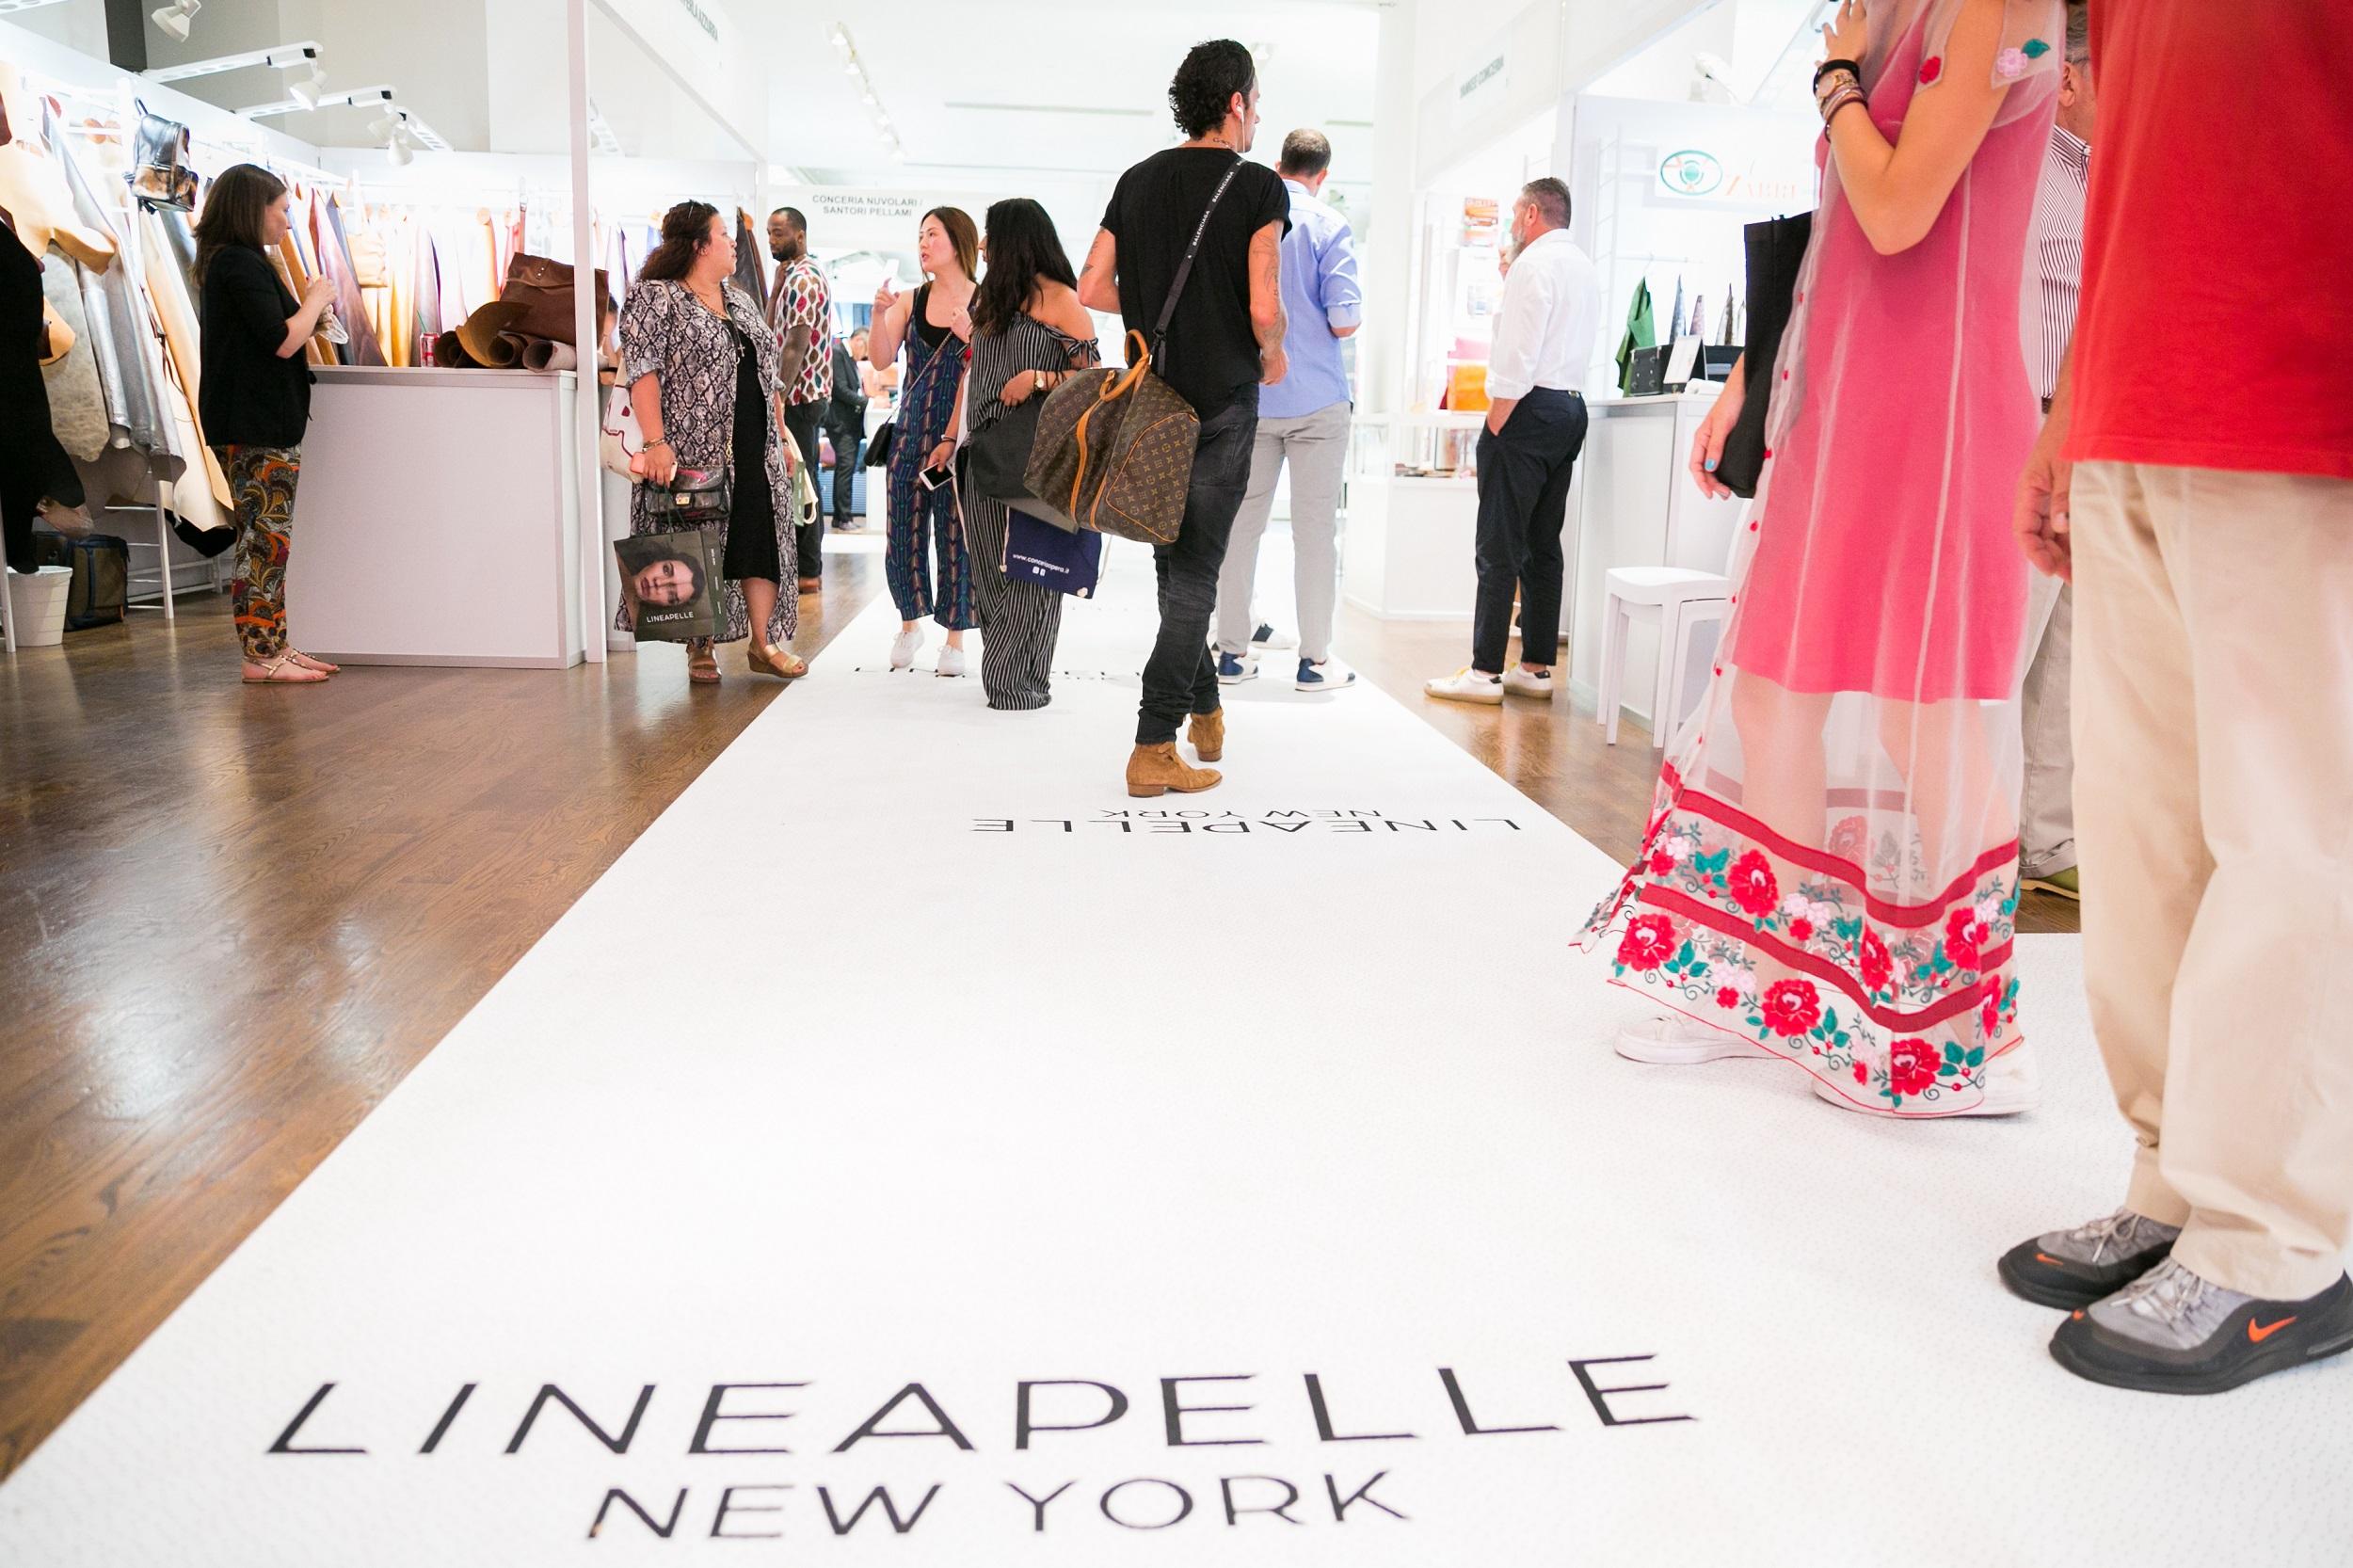 Footwear Components from Spain, Lineapelle, ICEX, Aeecc, salones de calzado